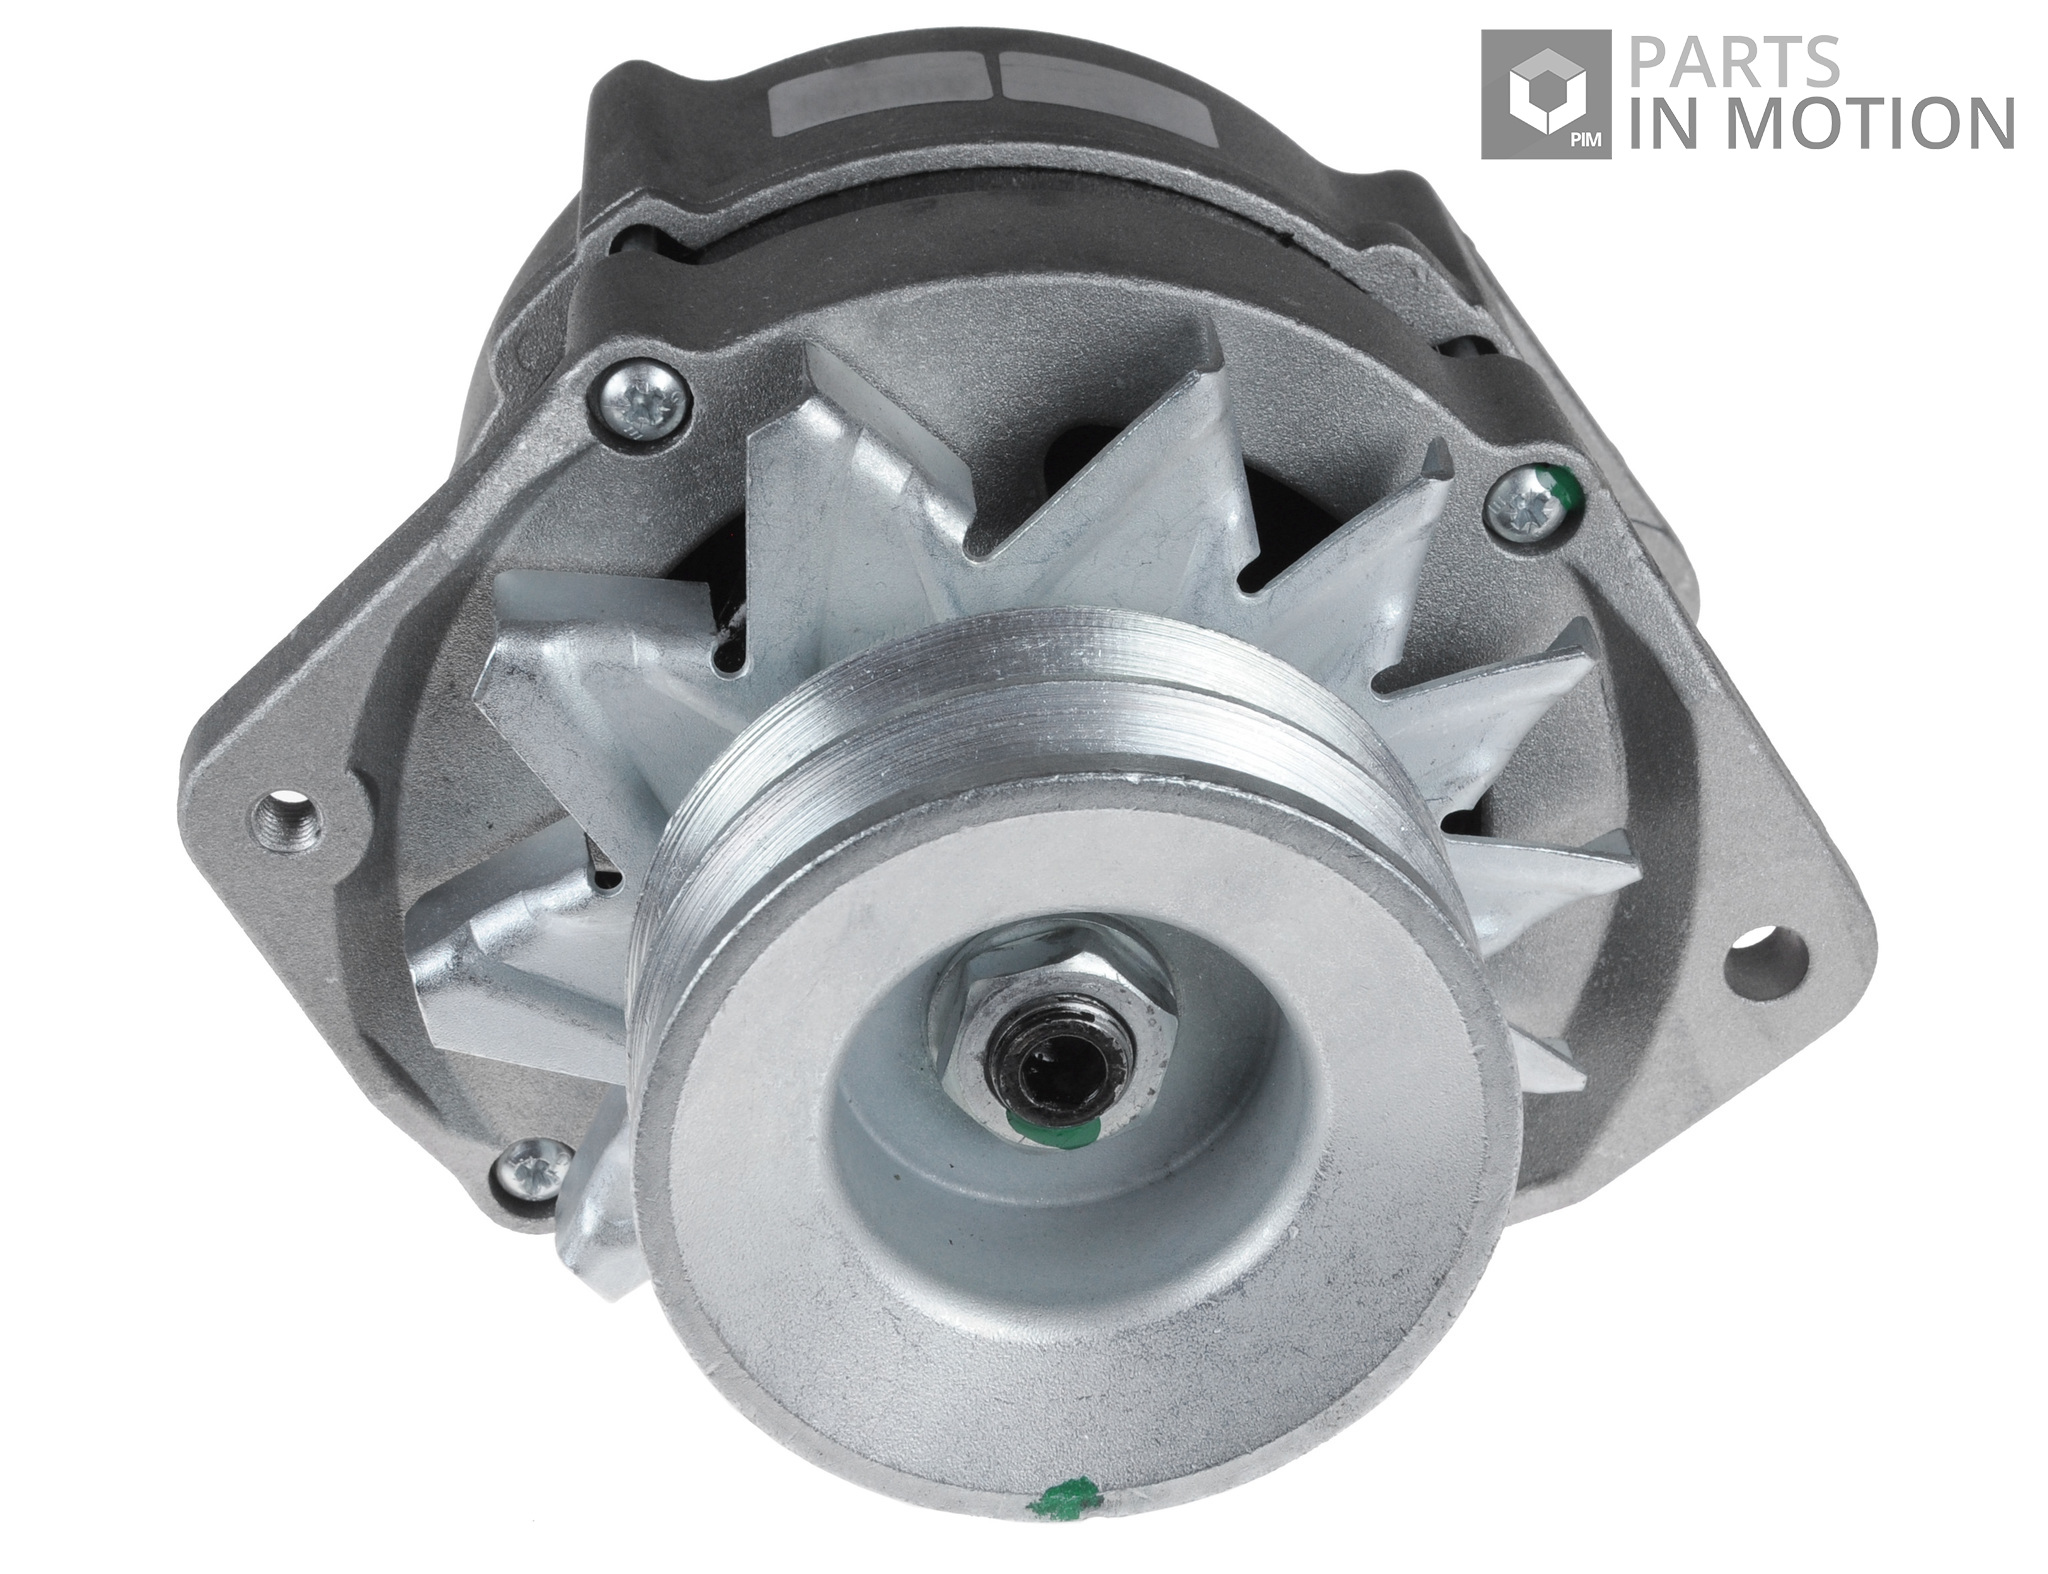 Alternator fits NISSAN SERENA C23 1.6 93 to 01 GA16DE ADL 231007C001 231007C000